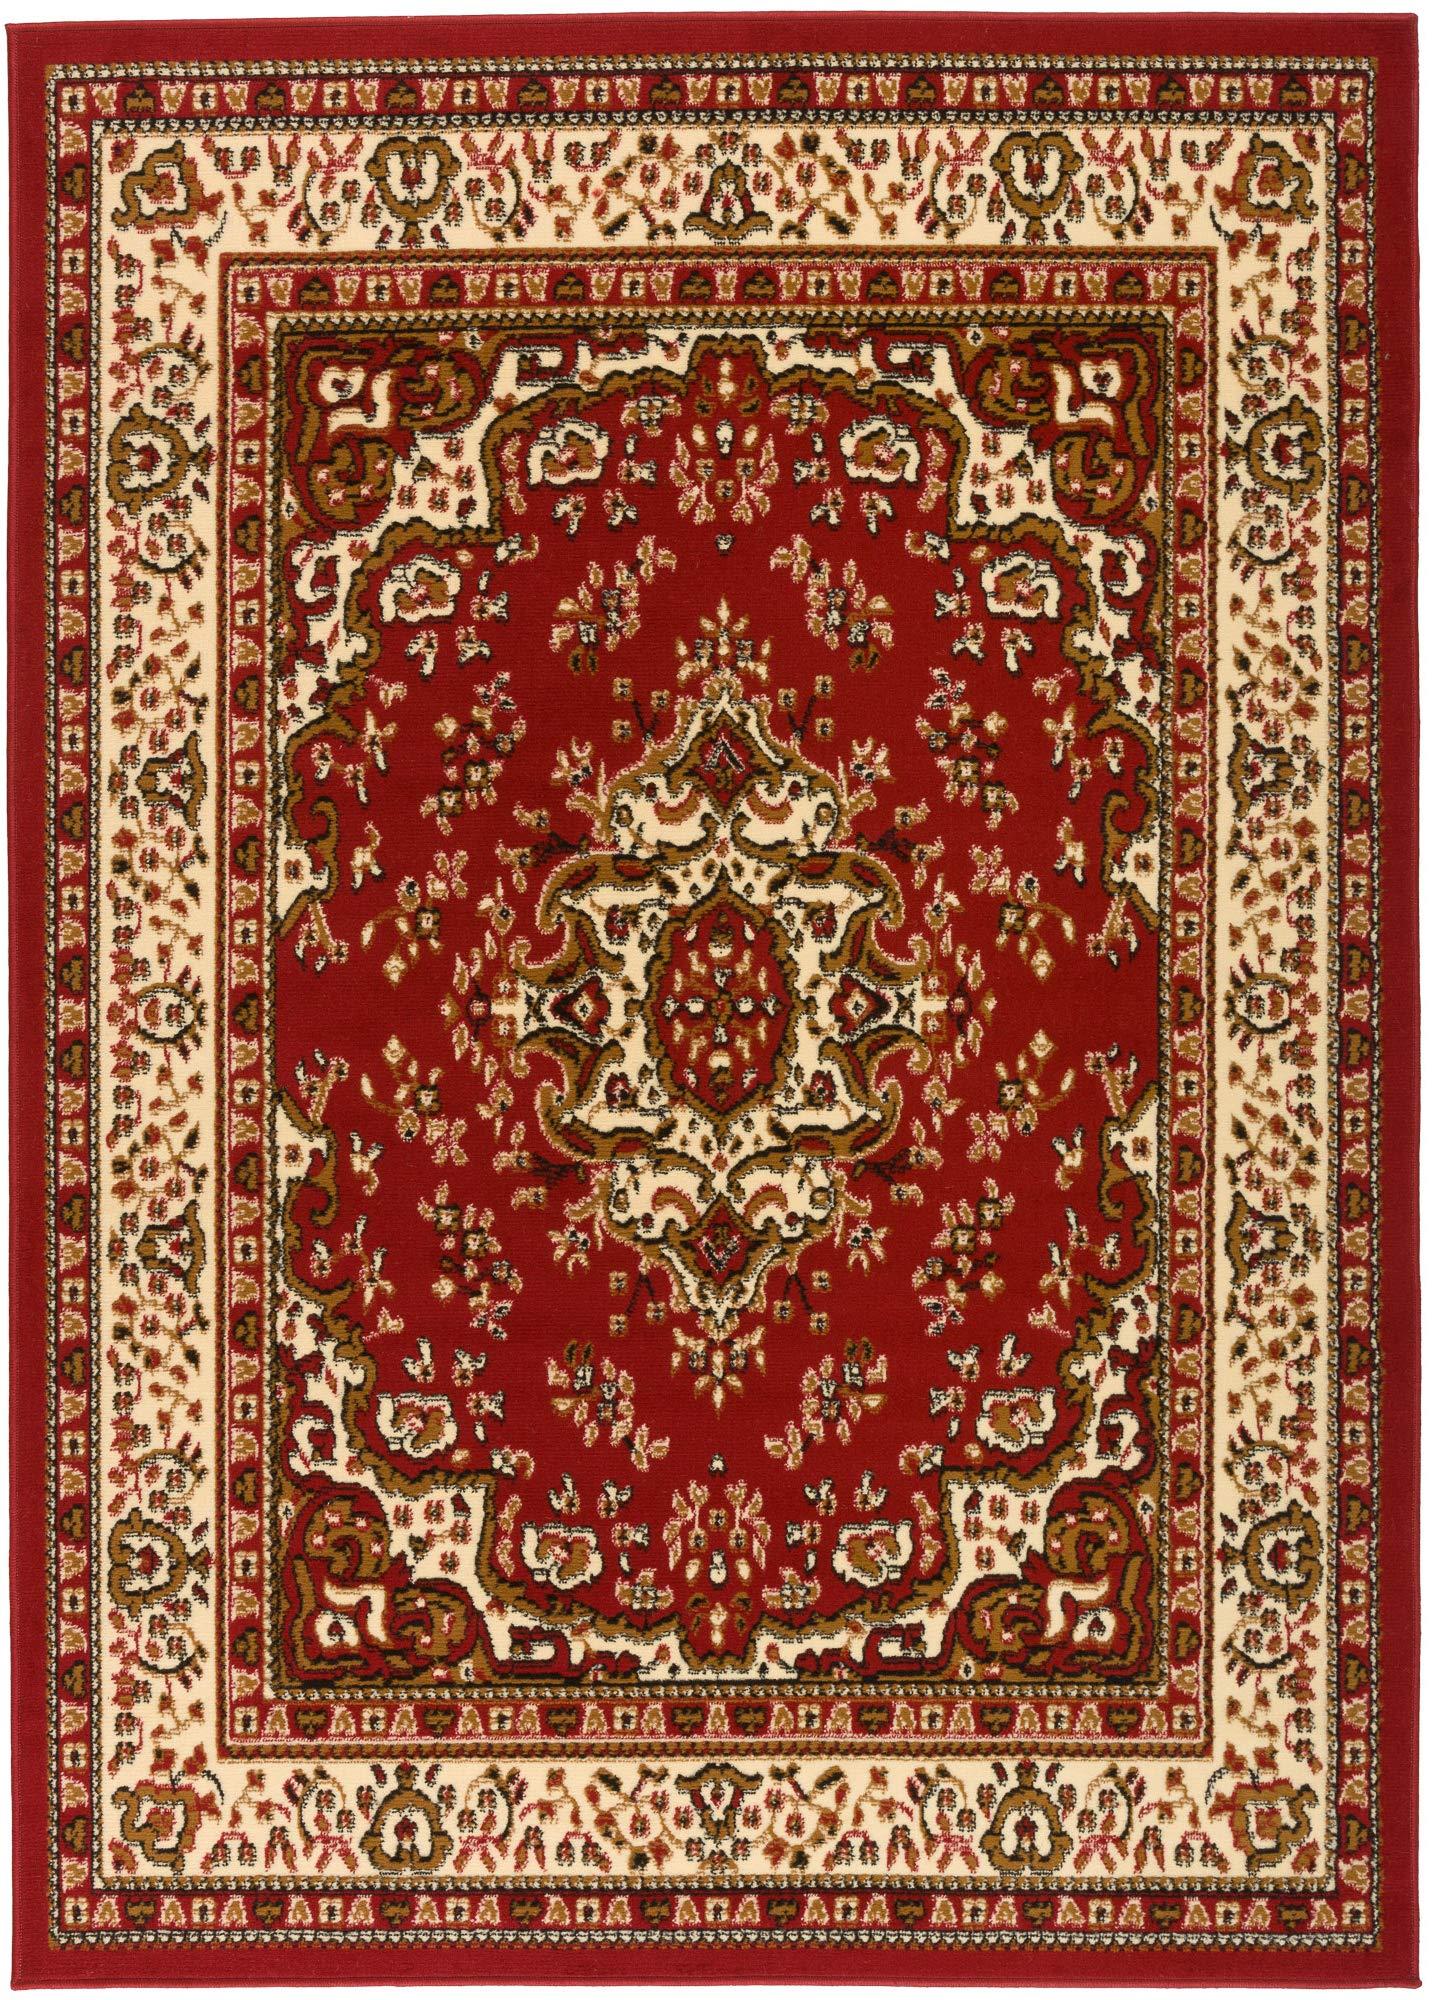 Antep Rugs Kashan King Collection Himalayas Oriental Polypropylene Indoor Area Rug (Maroon/Beige, 5' x 7')